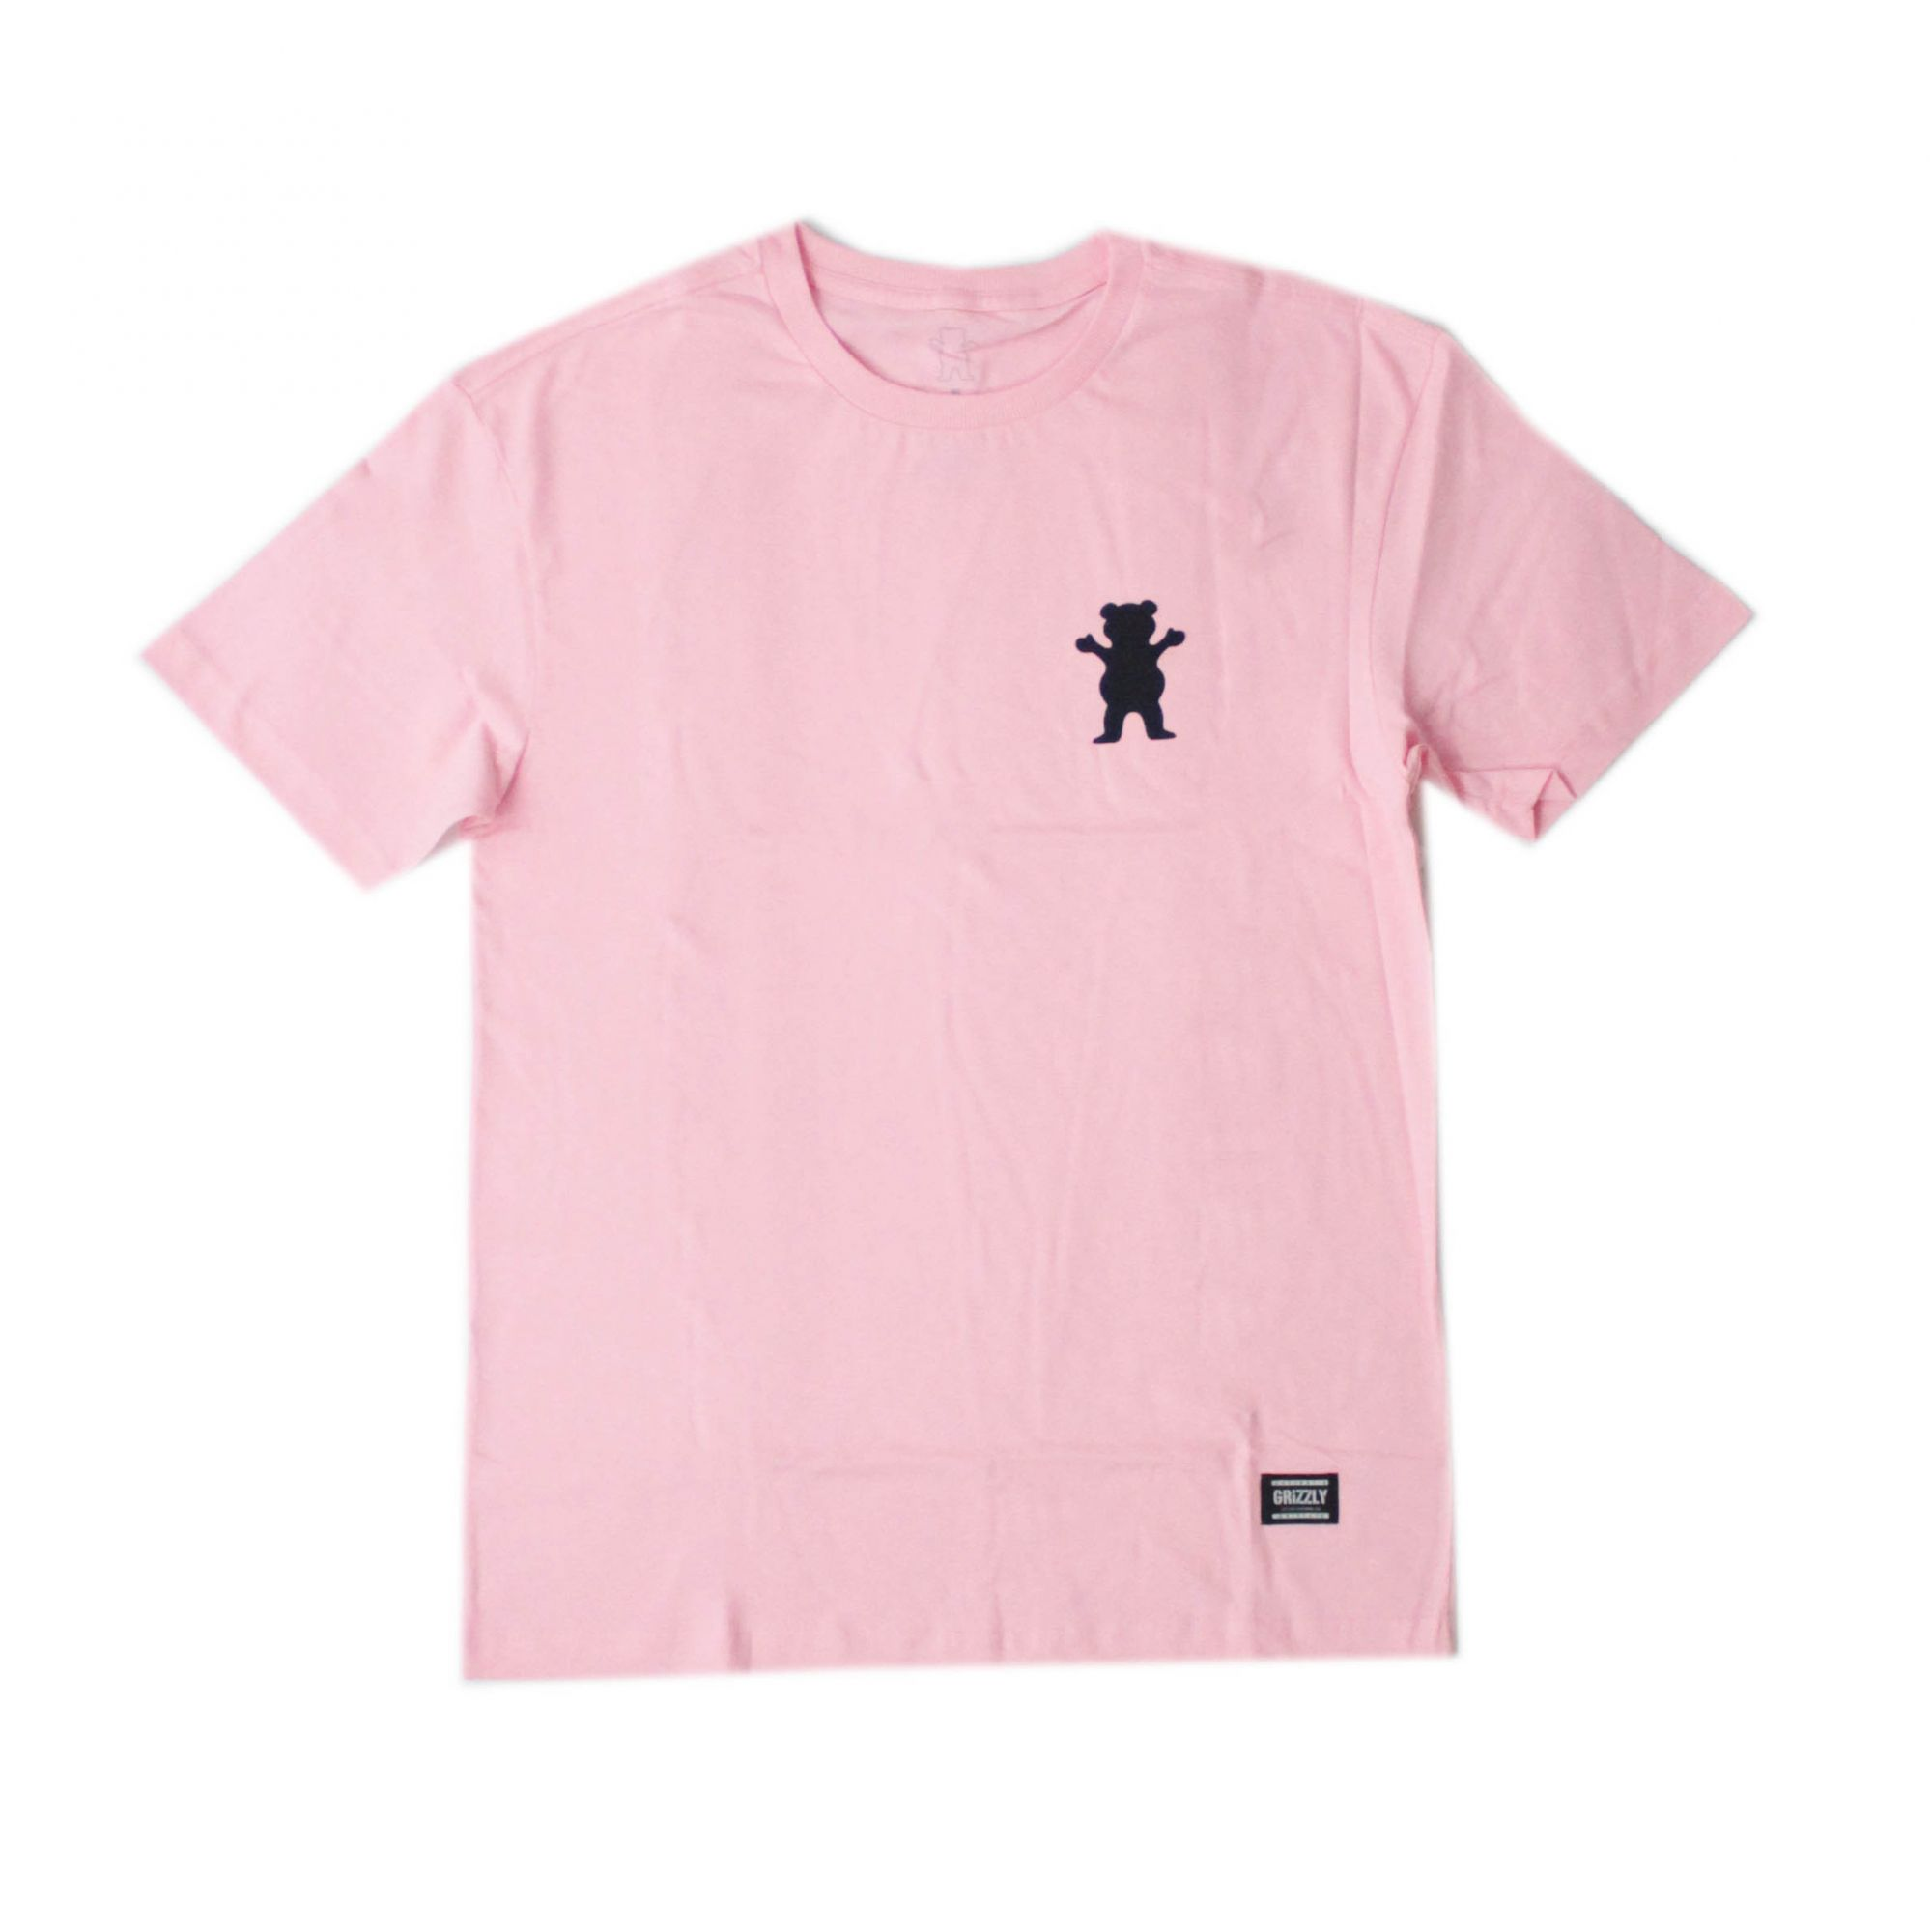 Camisa Grizzly Og Mini Bear Rosa/Preto